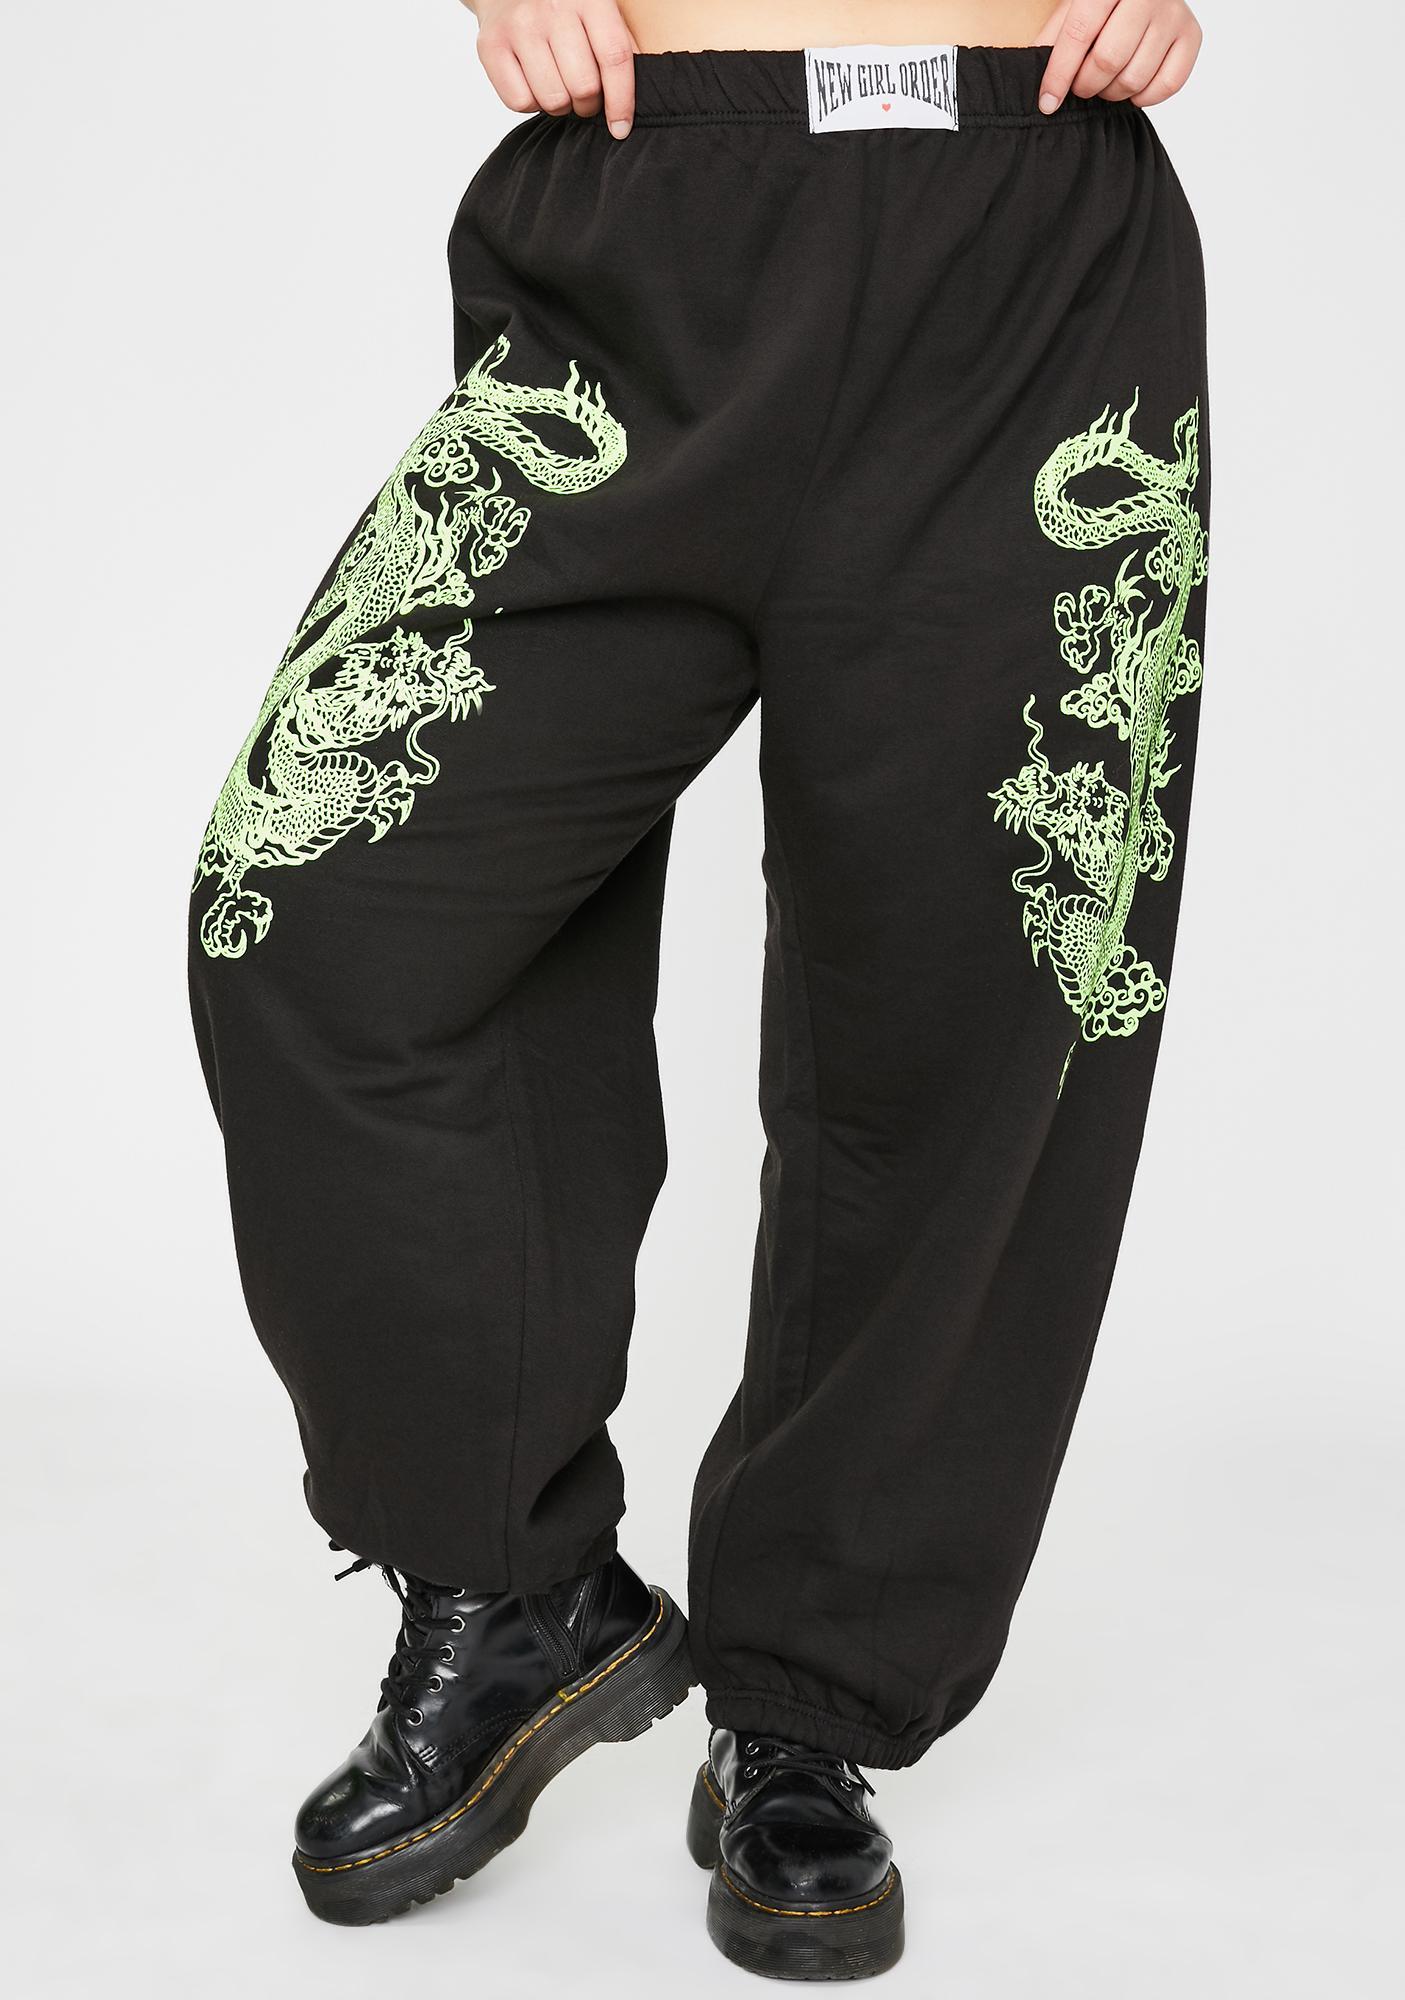 Unisex Baby Jogger Pants The Dragon Sweatpants